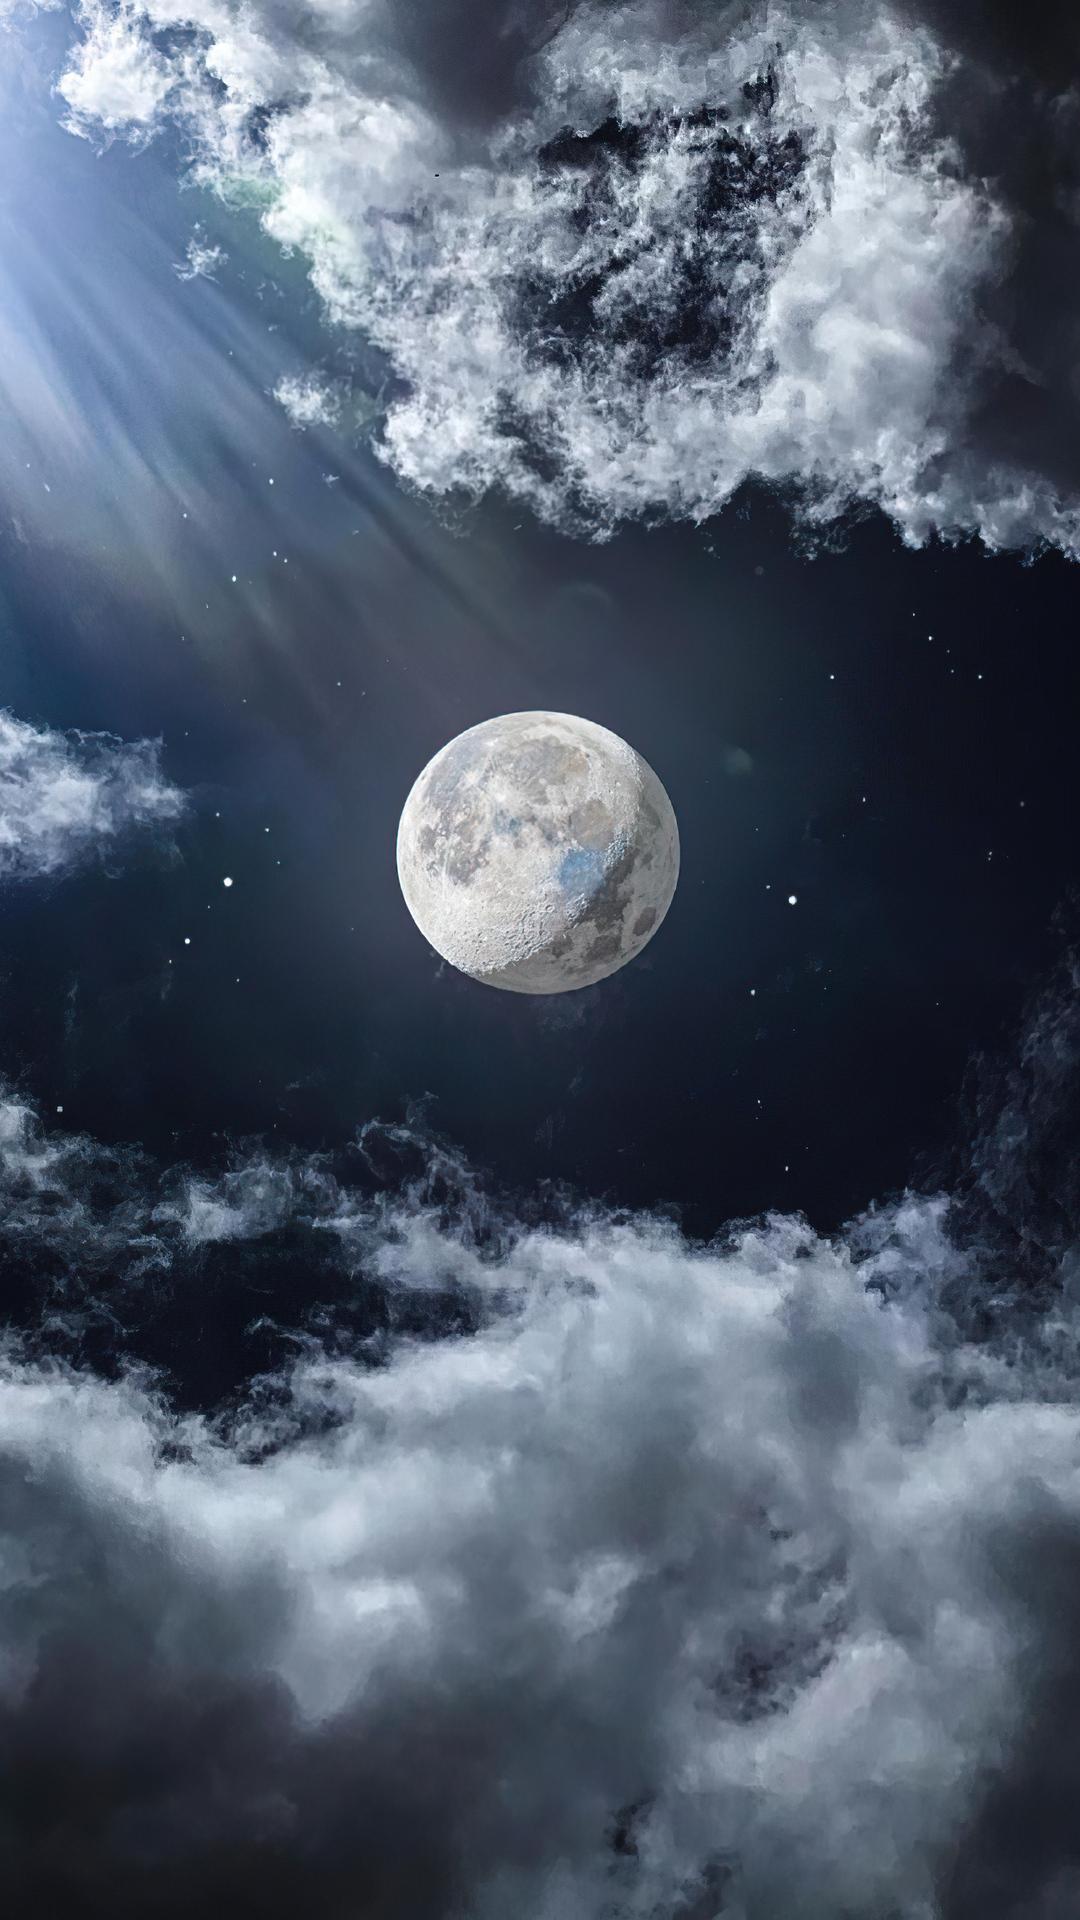 moon-sky-5k-r8.jpg